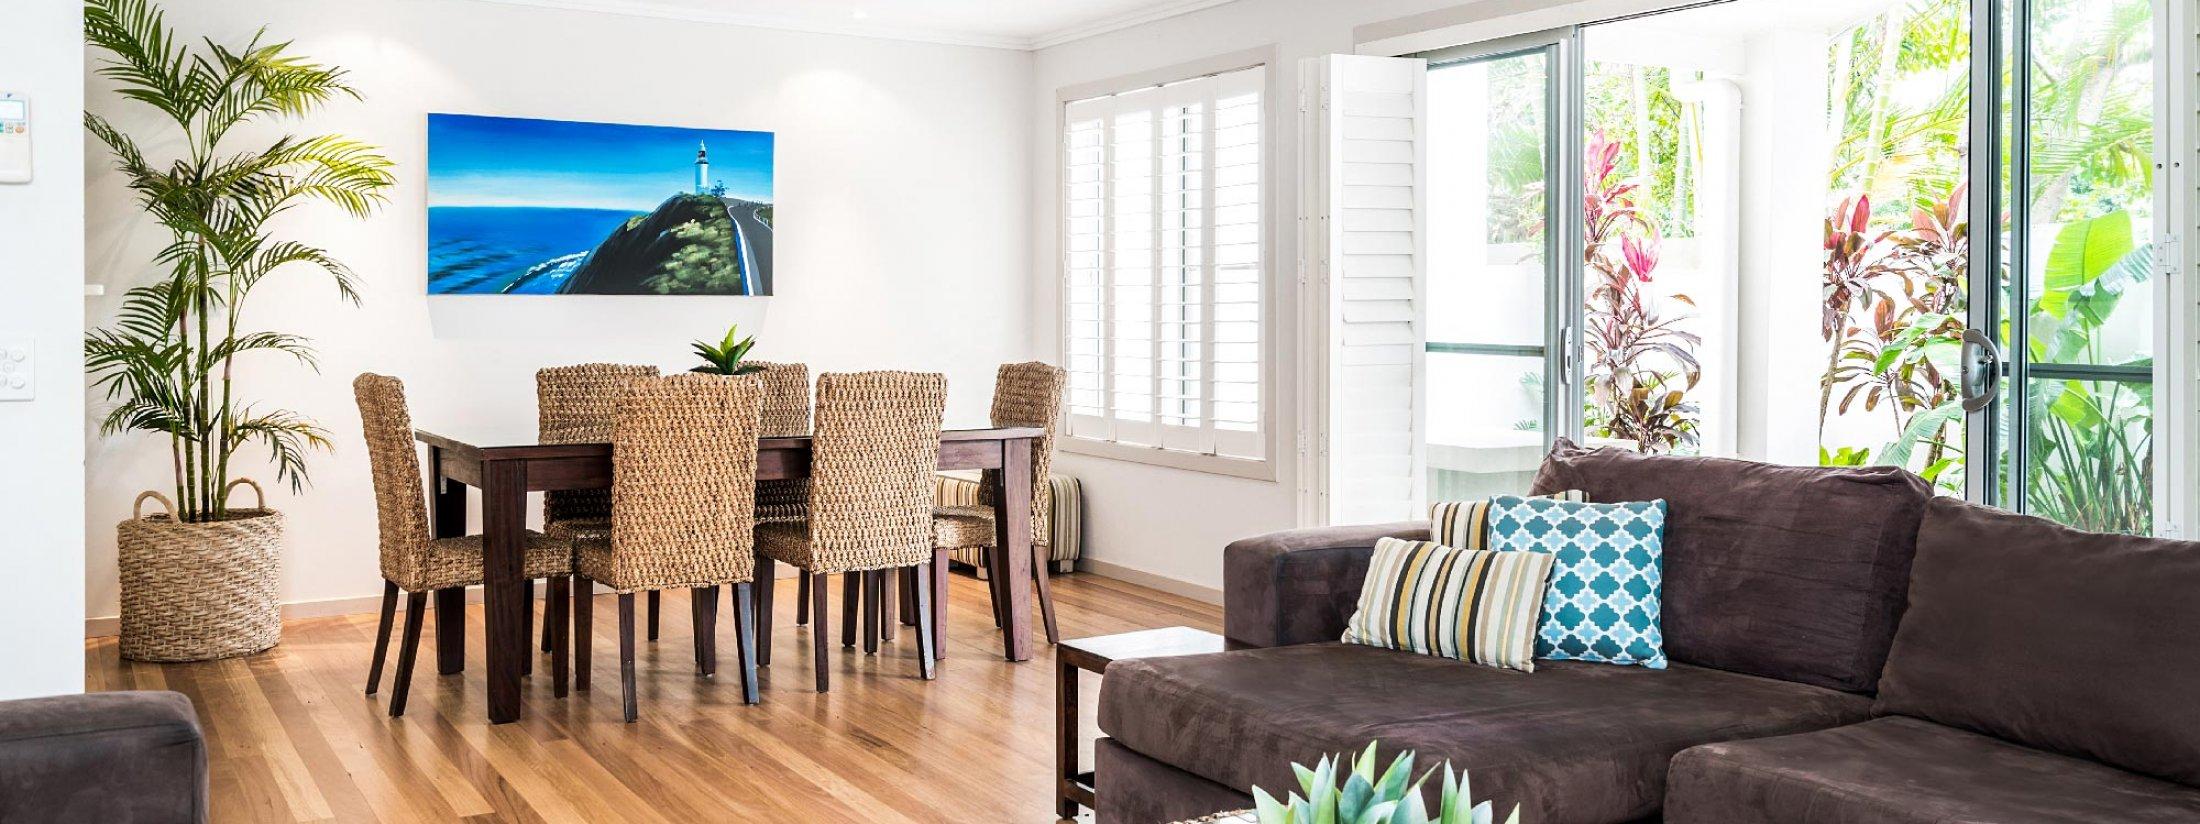 At Driftaway - Byron Bay - Living and Dining Area